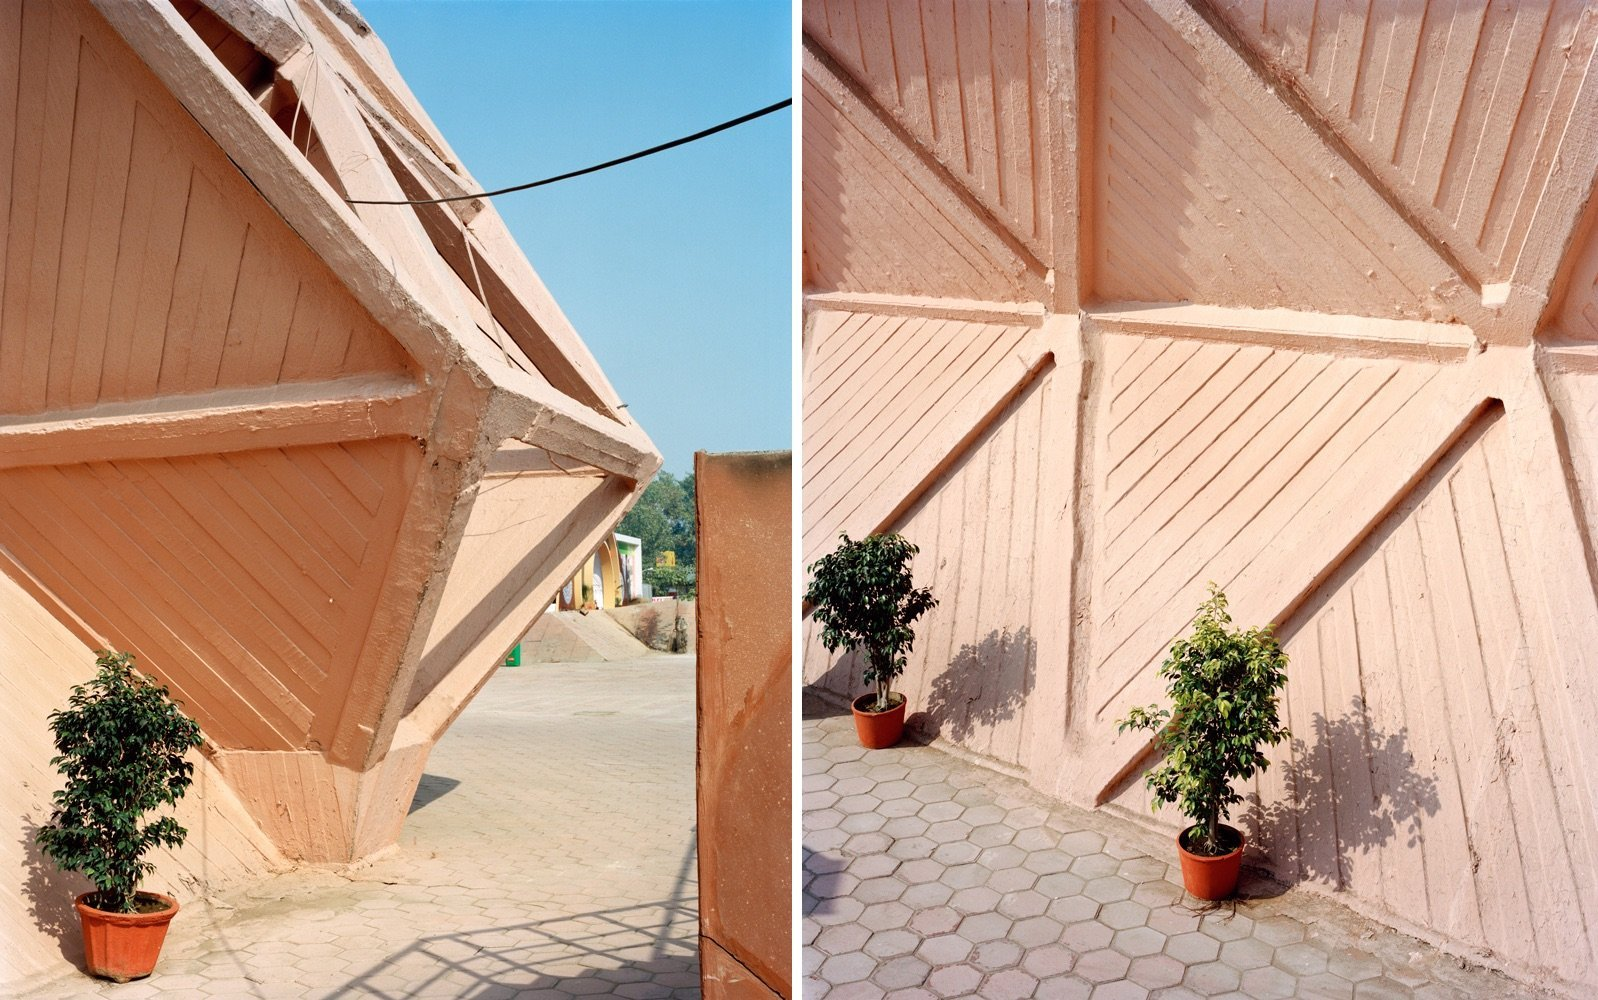 151115_HoN-triangles-w-plants.jpg